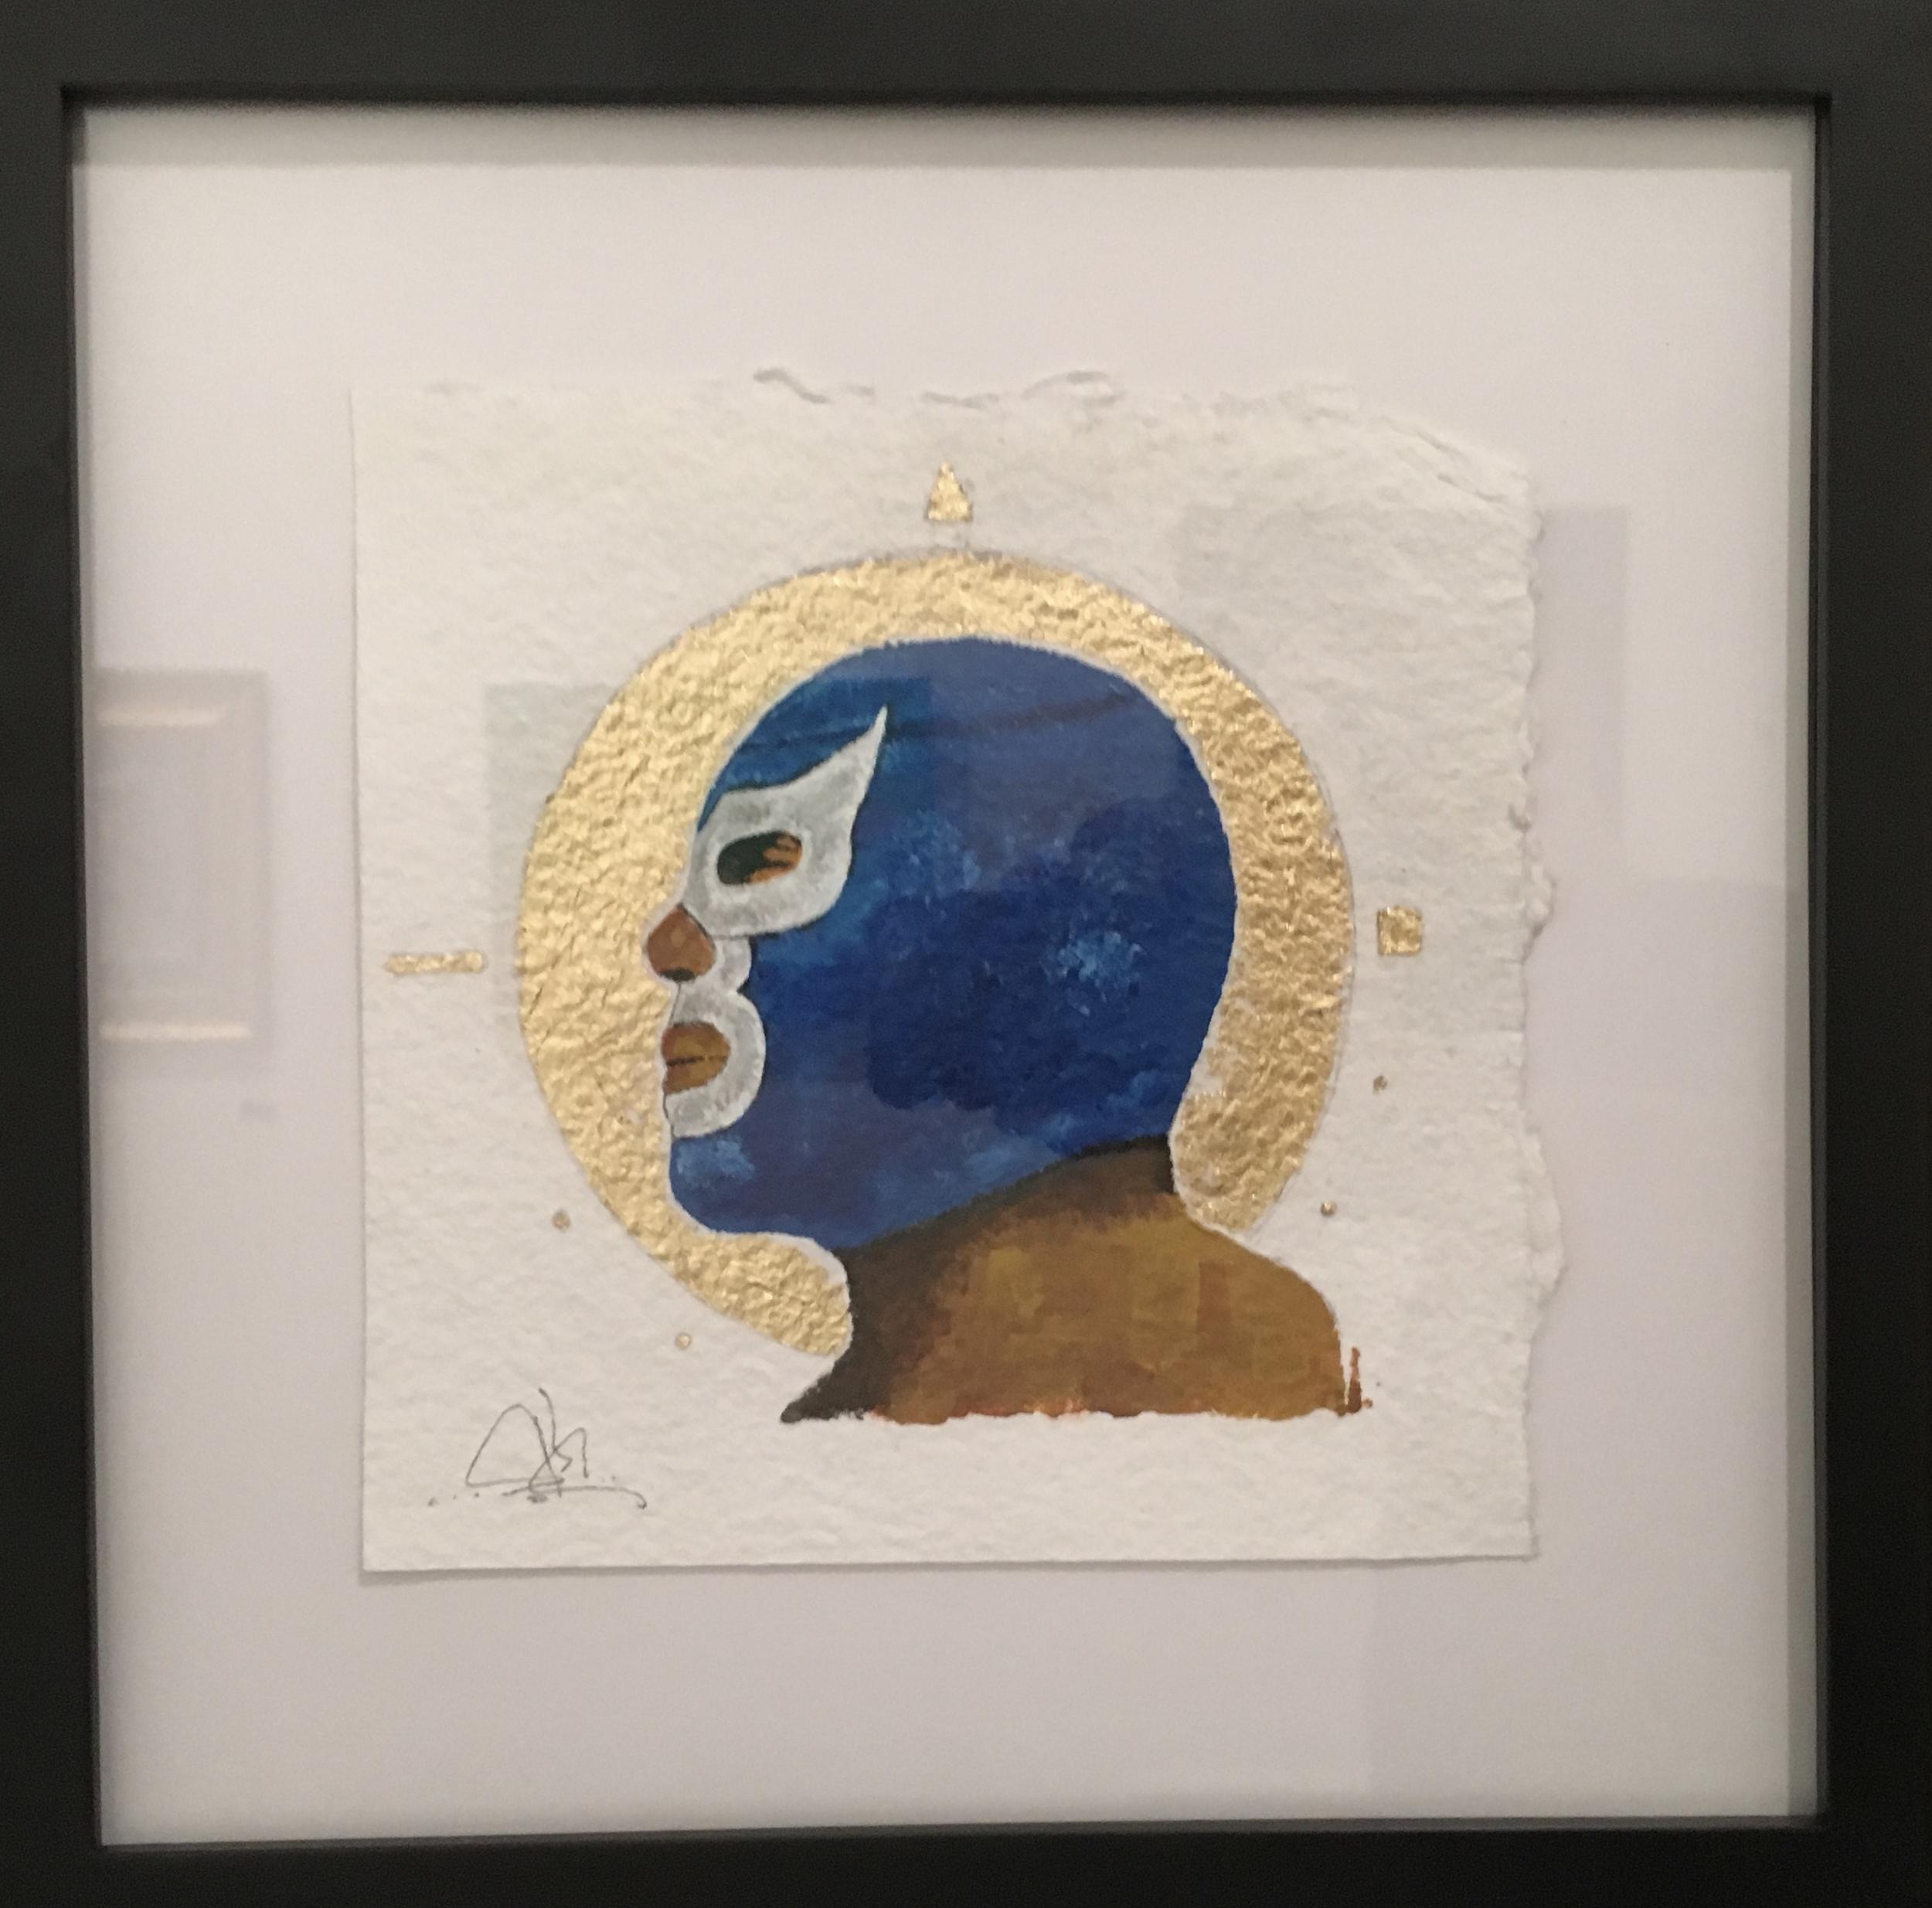 Blue Demon by Steven (Sick.TLZ) Huerta